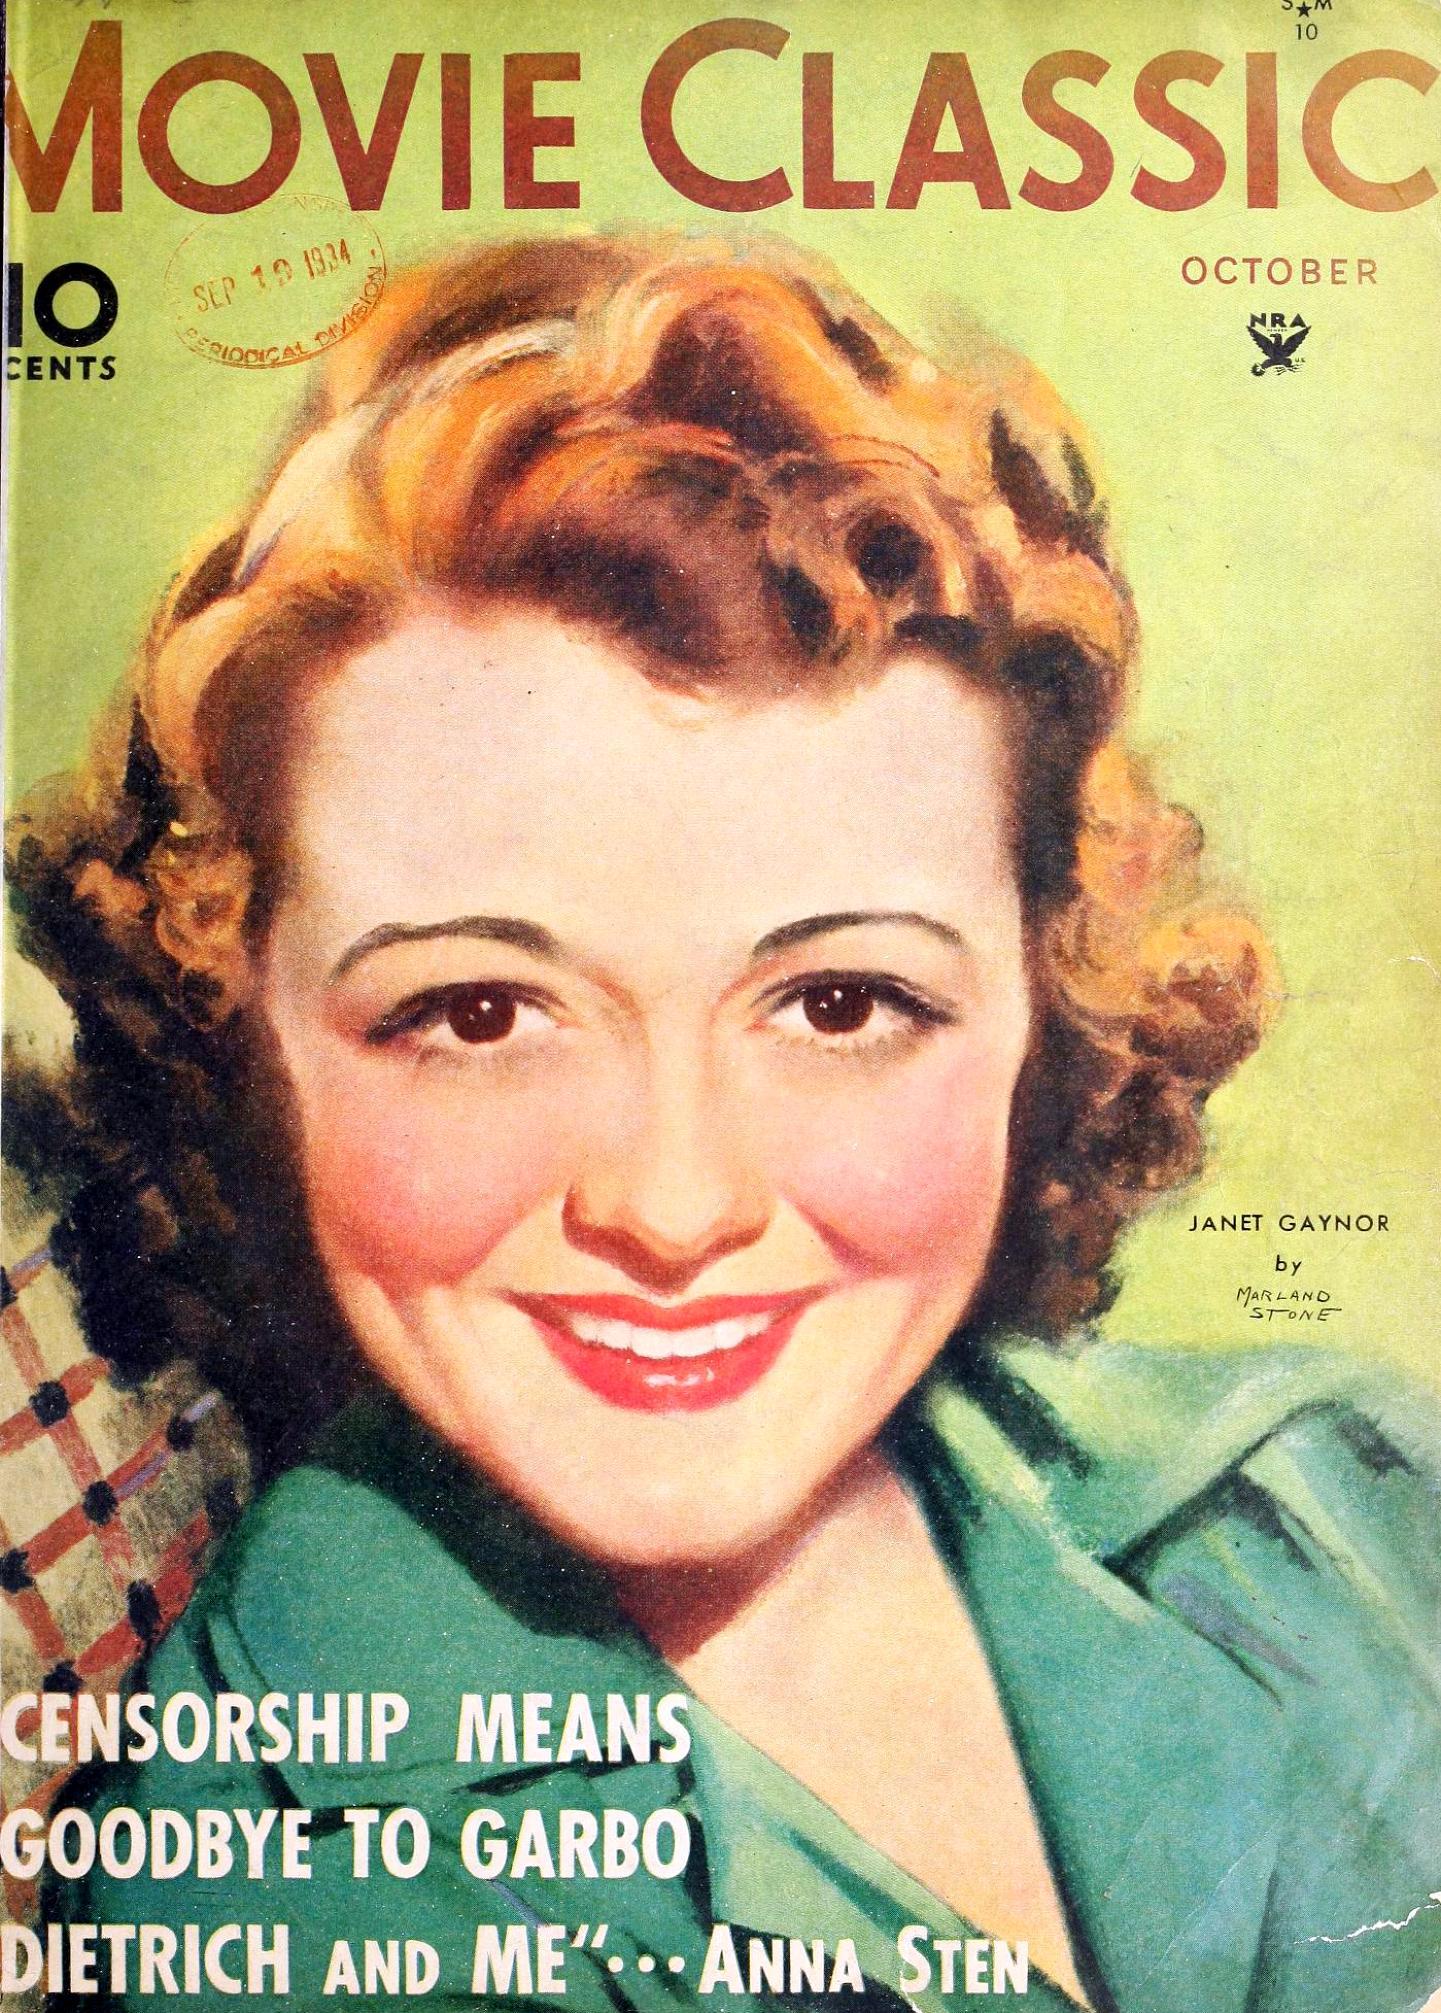 movie classic october 1934b cover